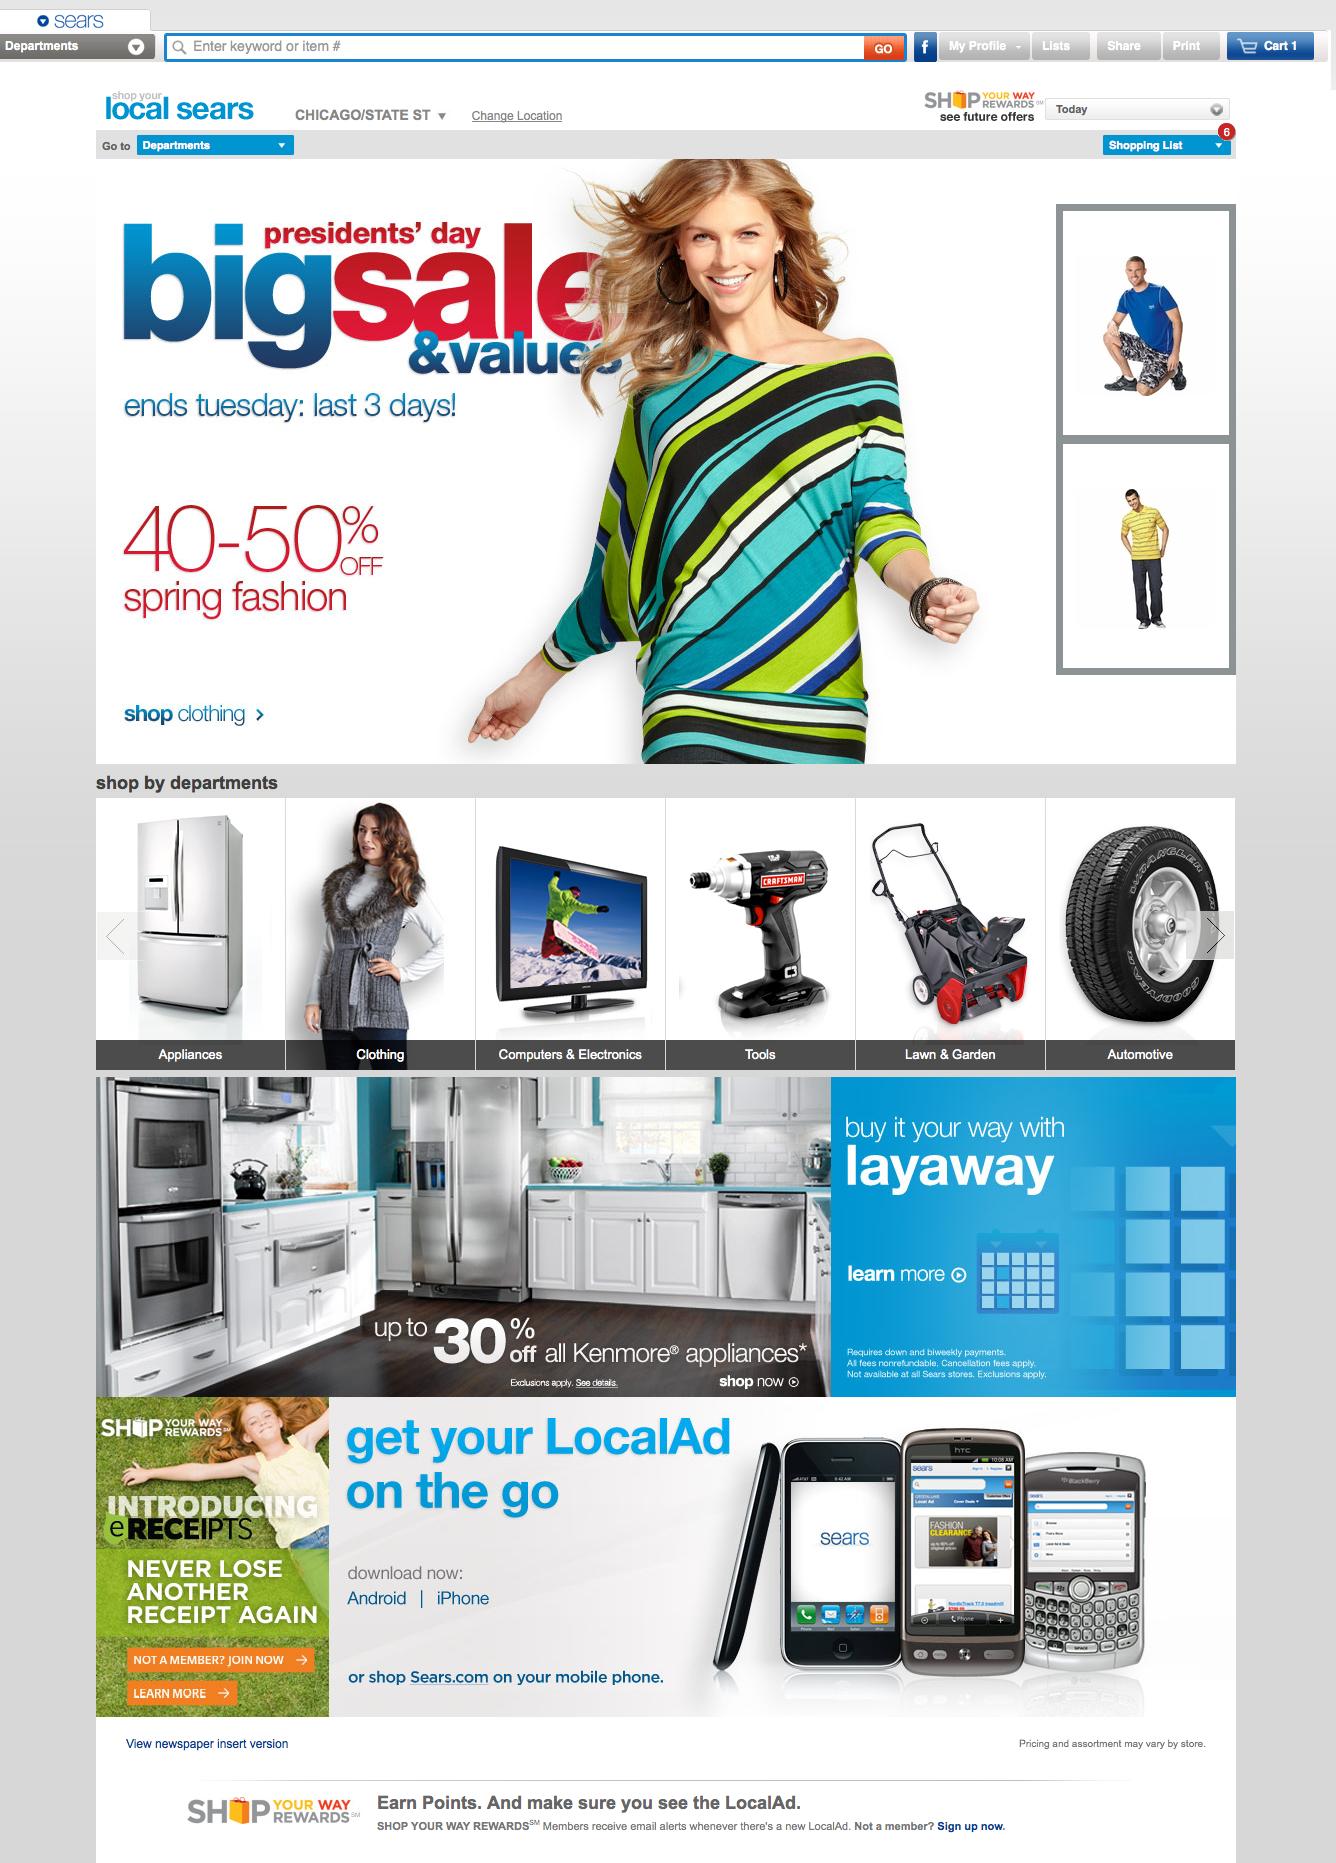 Cover page - desktop